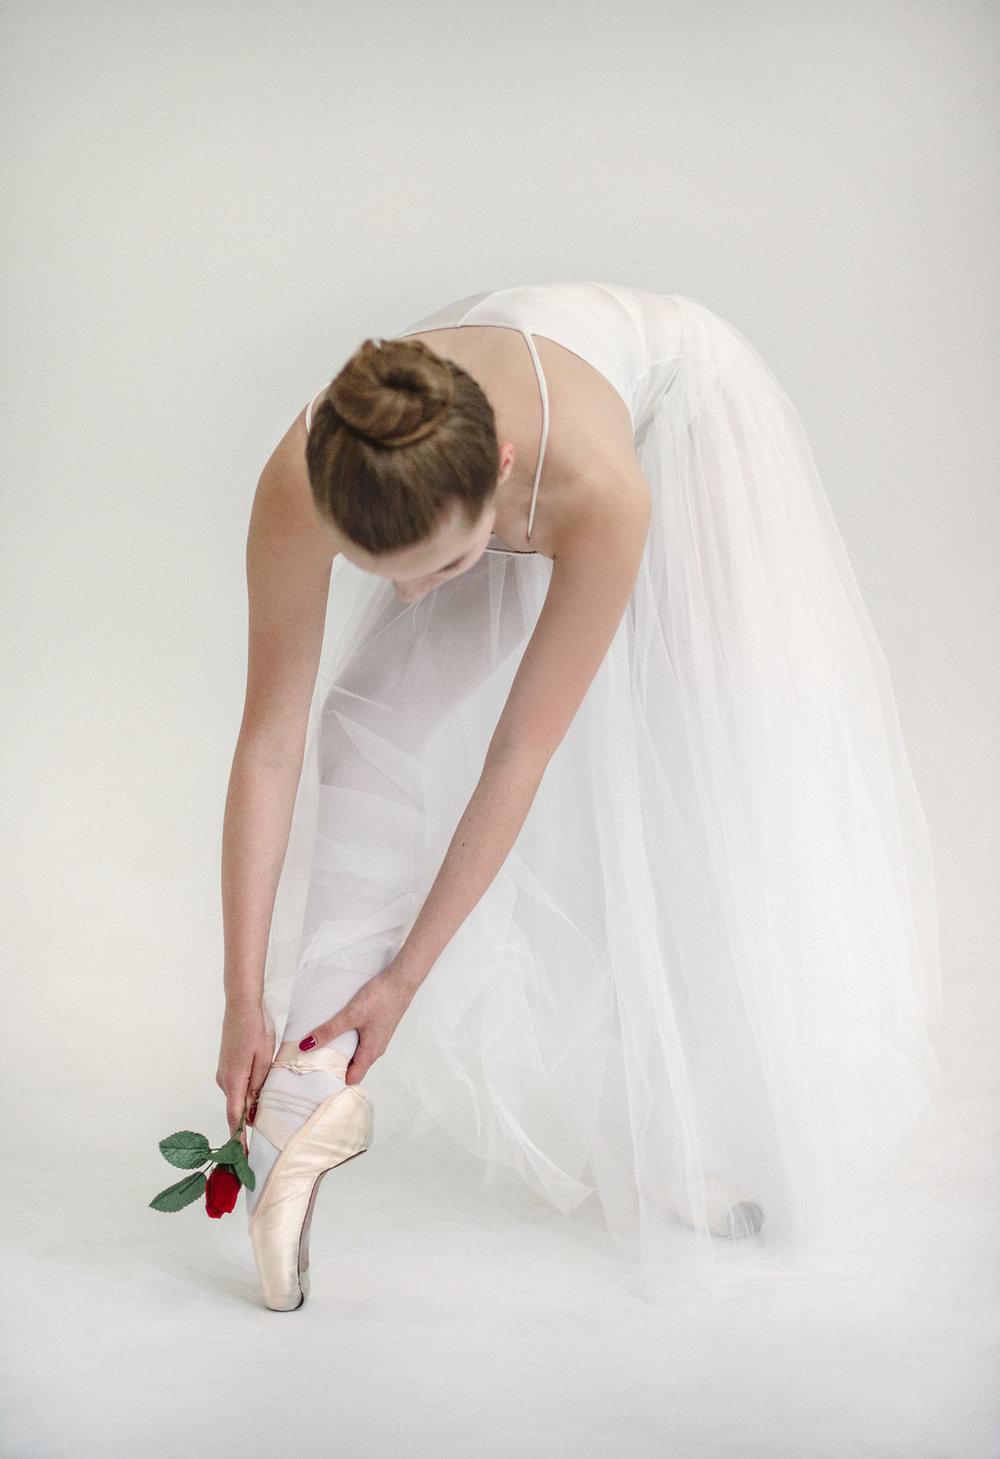 Cro&KowStudio_ballerina1.jpg